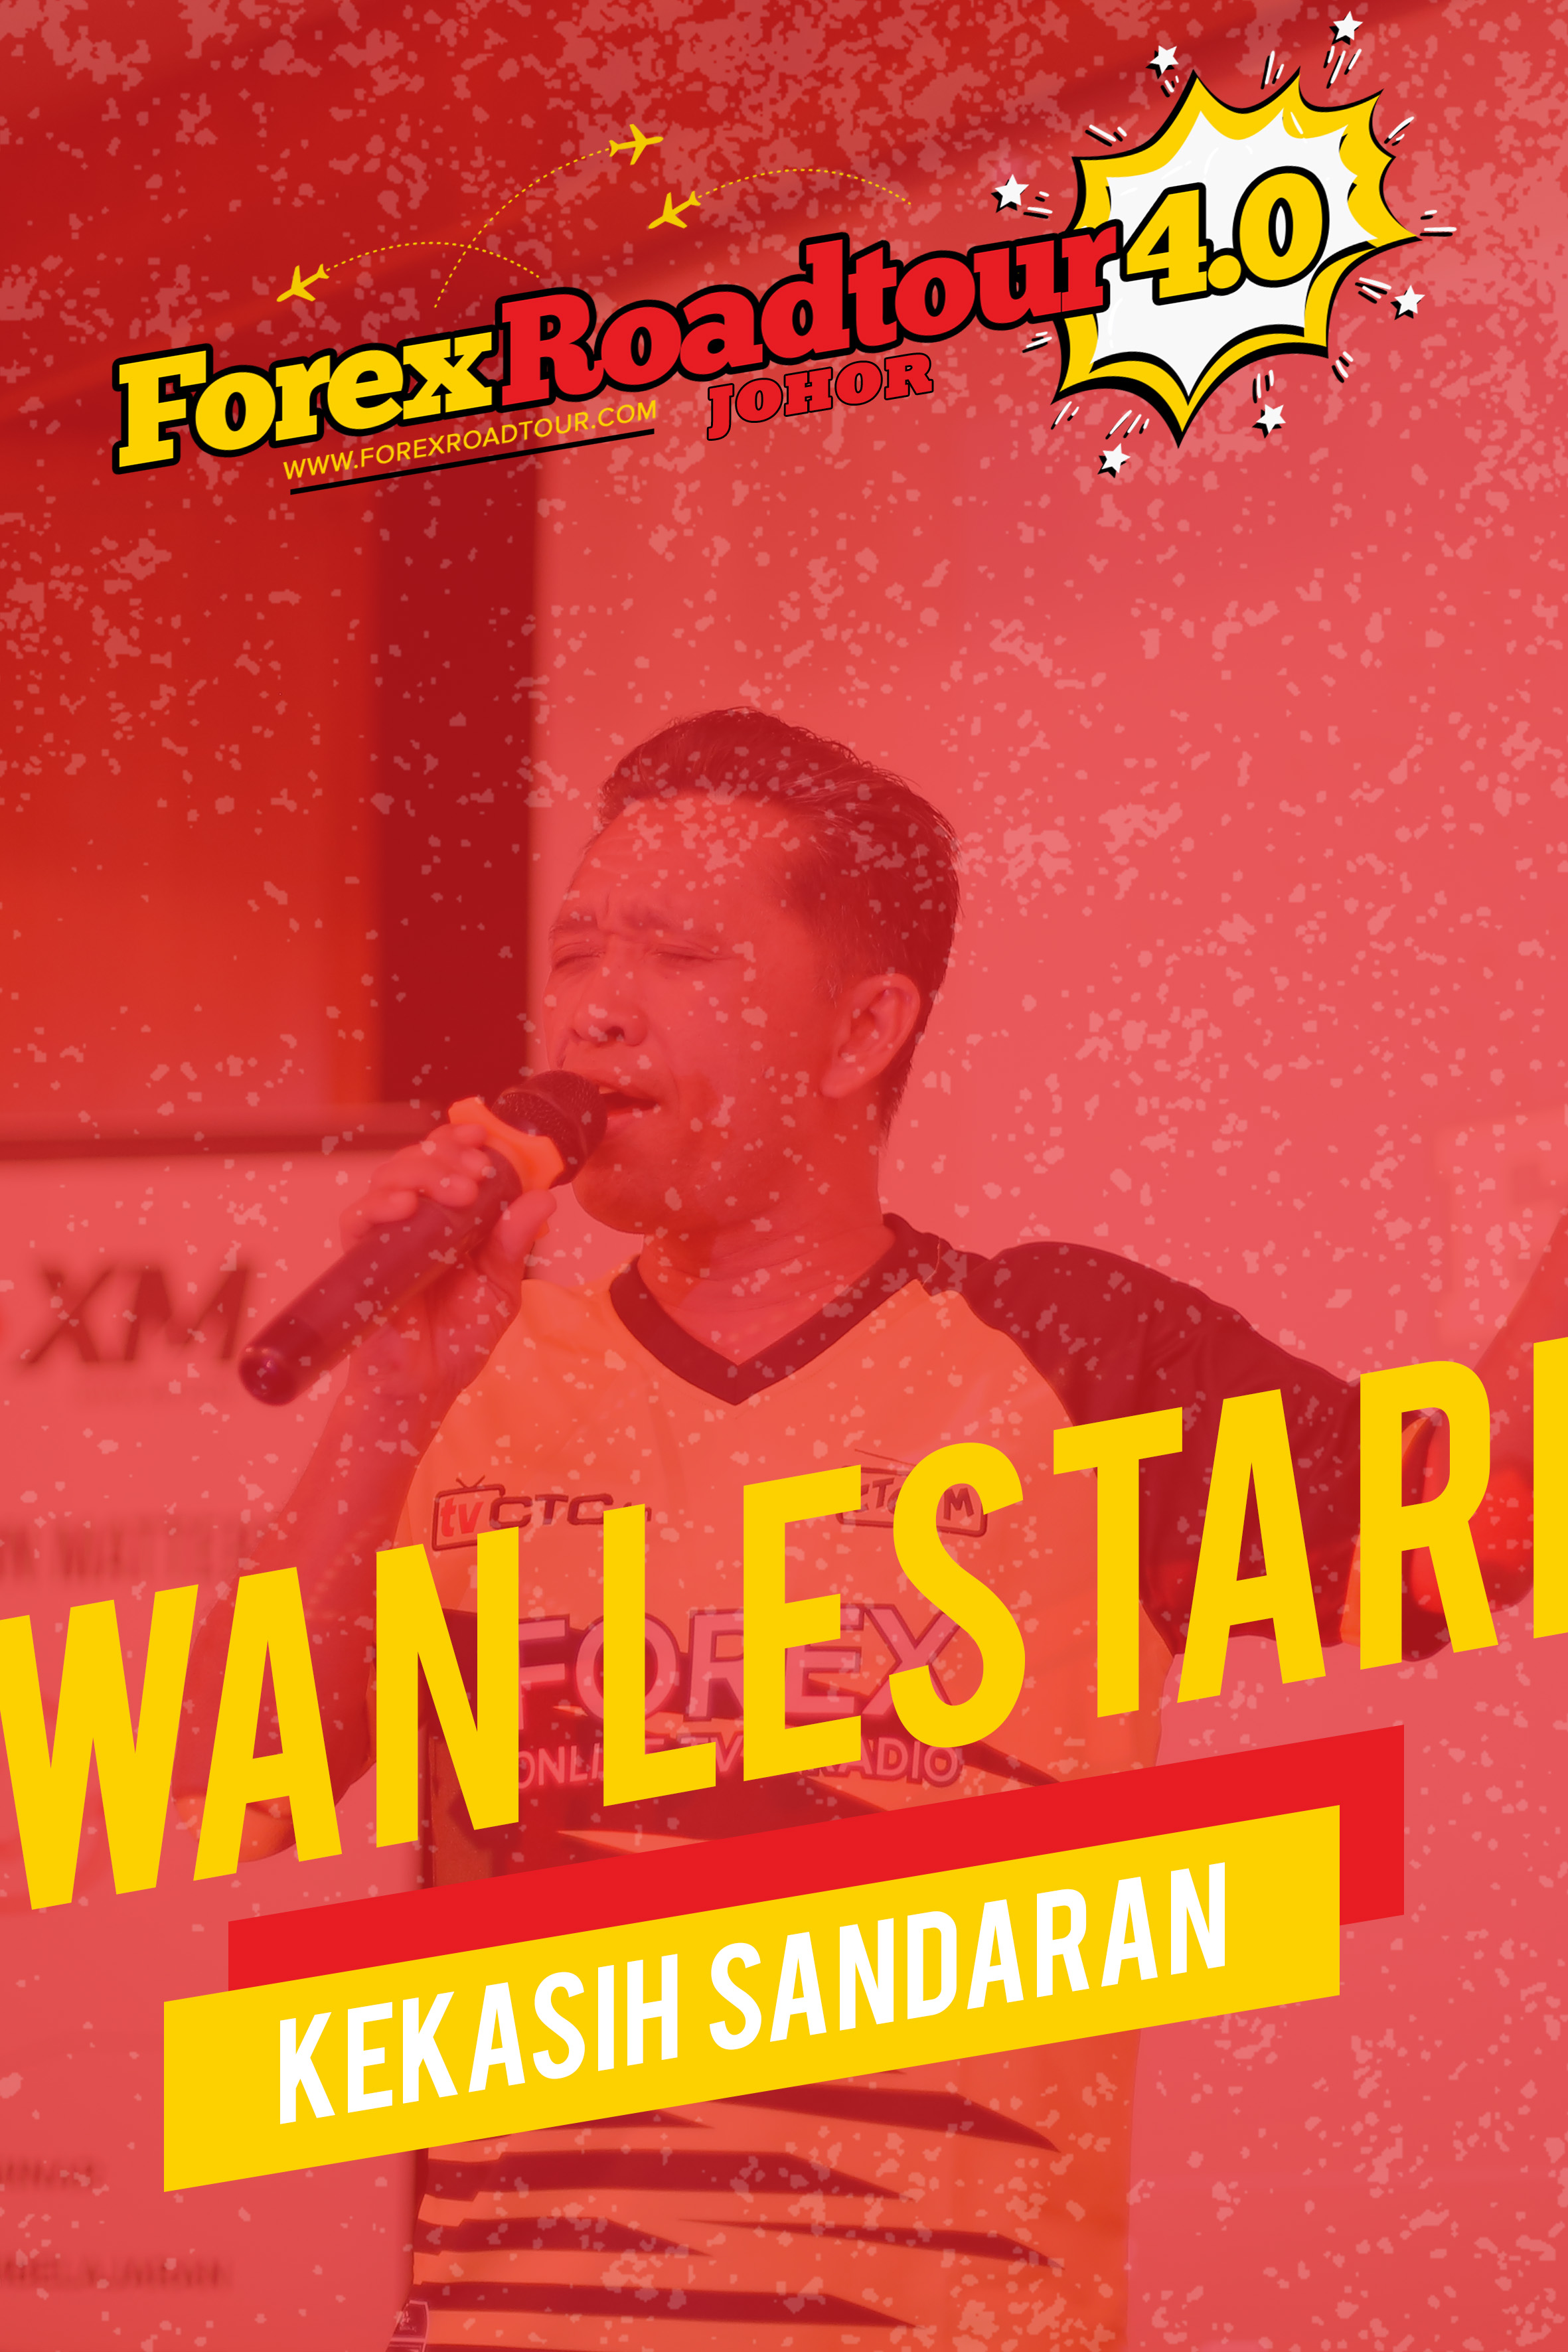 Wan Lestari - Kekasih Sandaran [Forex Roadtour 4.0 Johor]